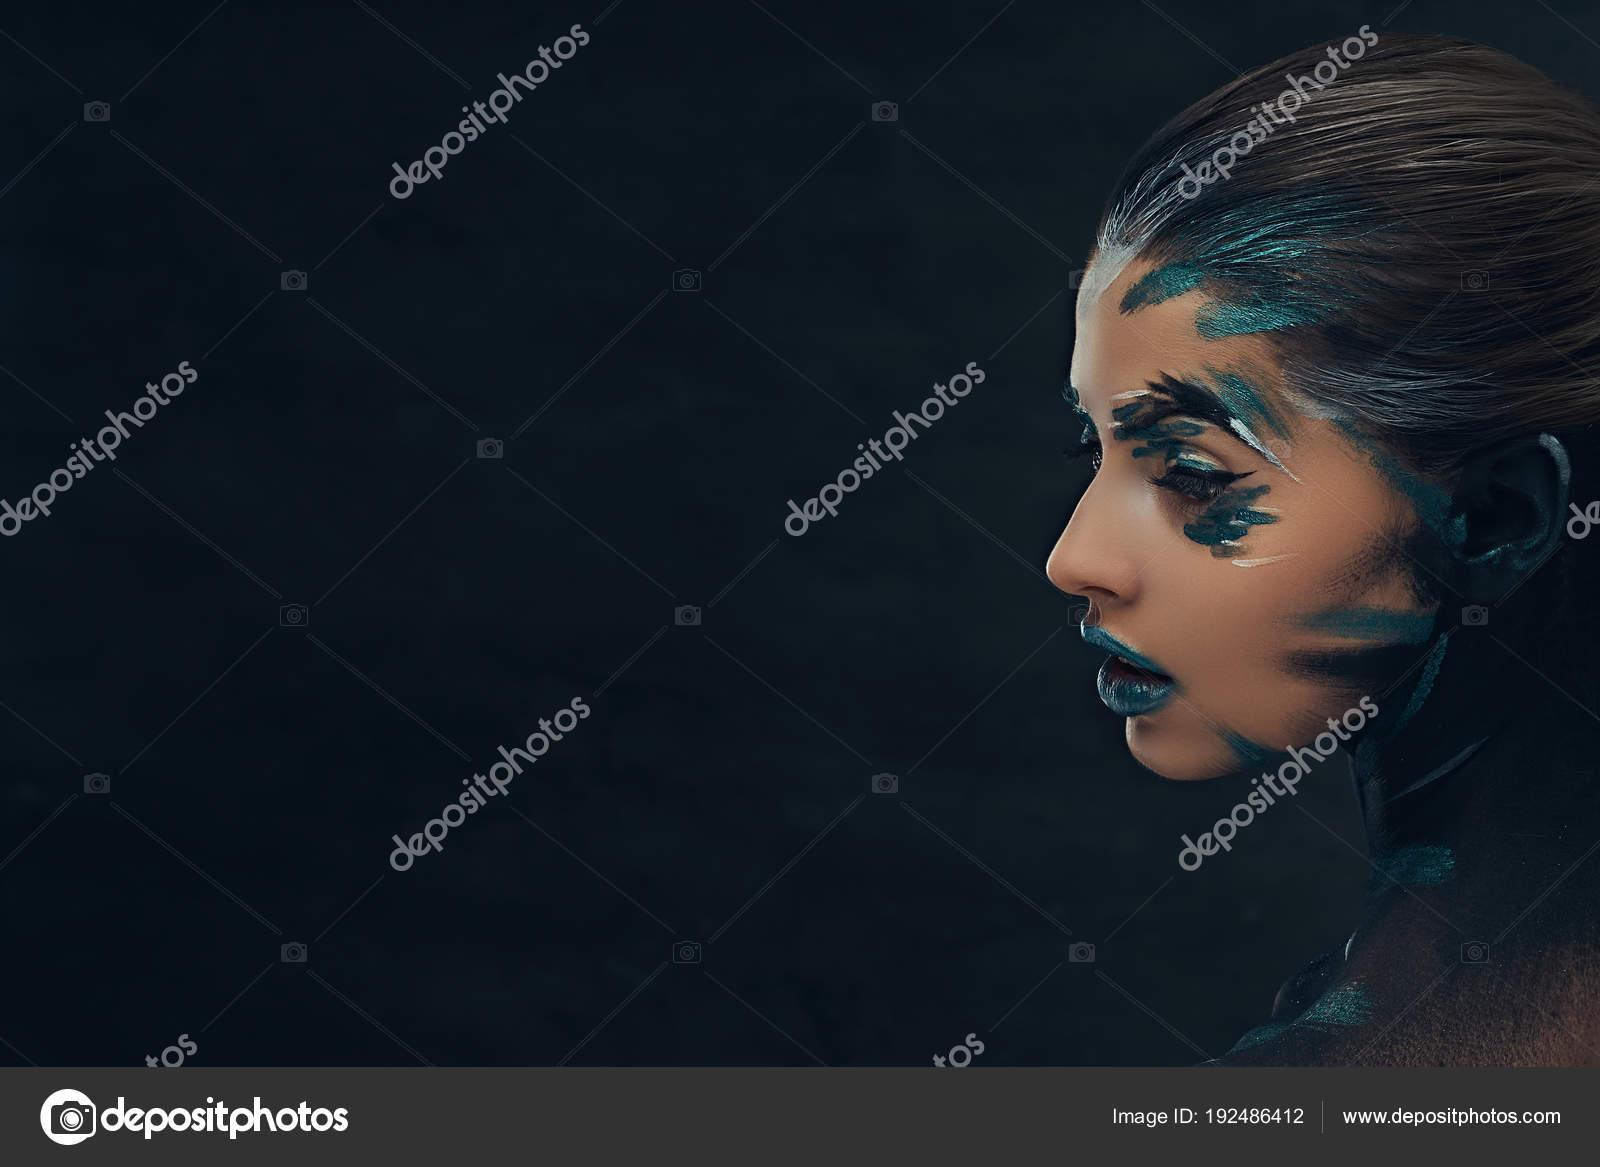 Пизда и лицо девушки на одном фото Частное фото 4